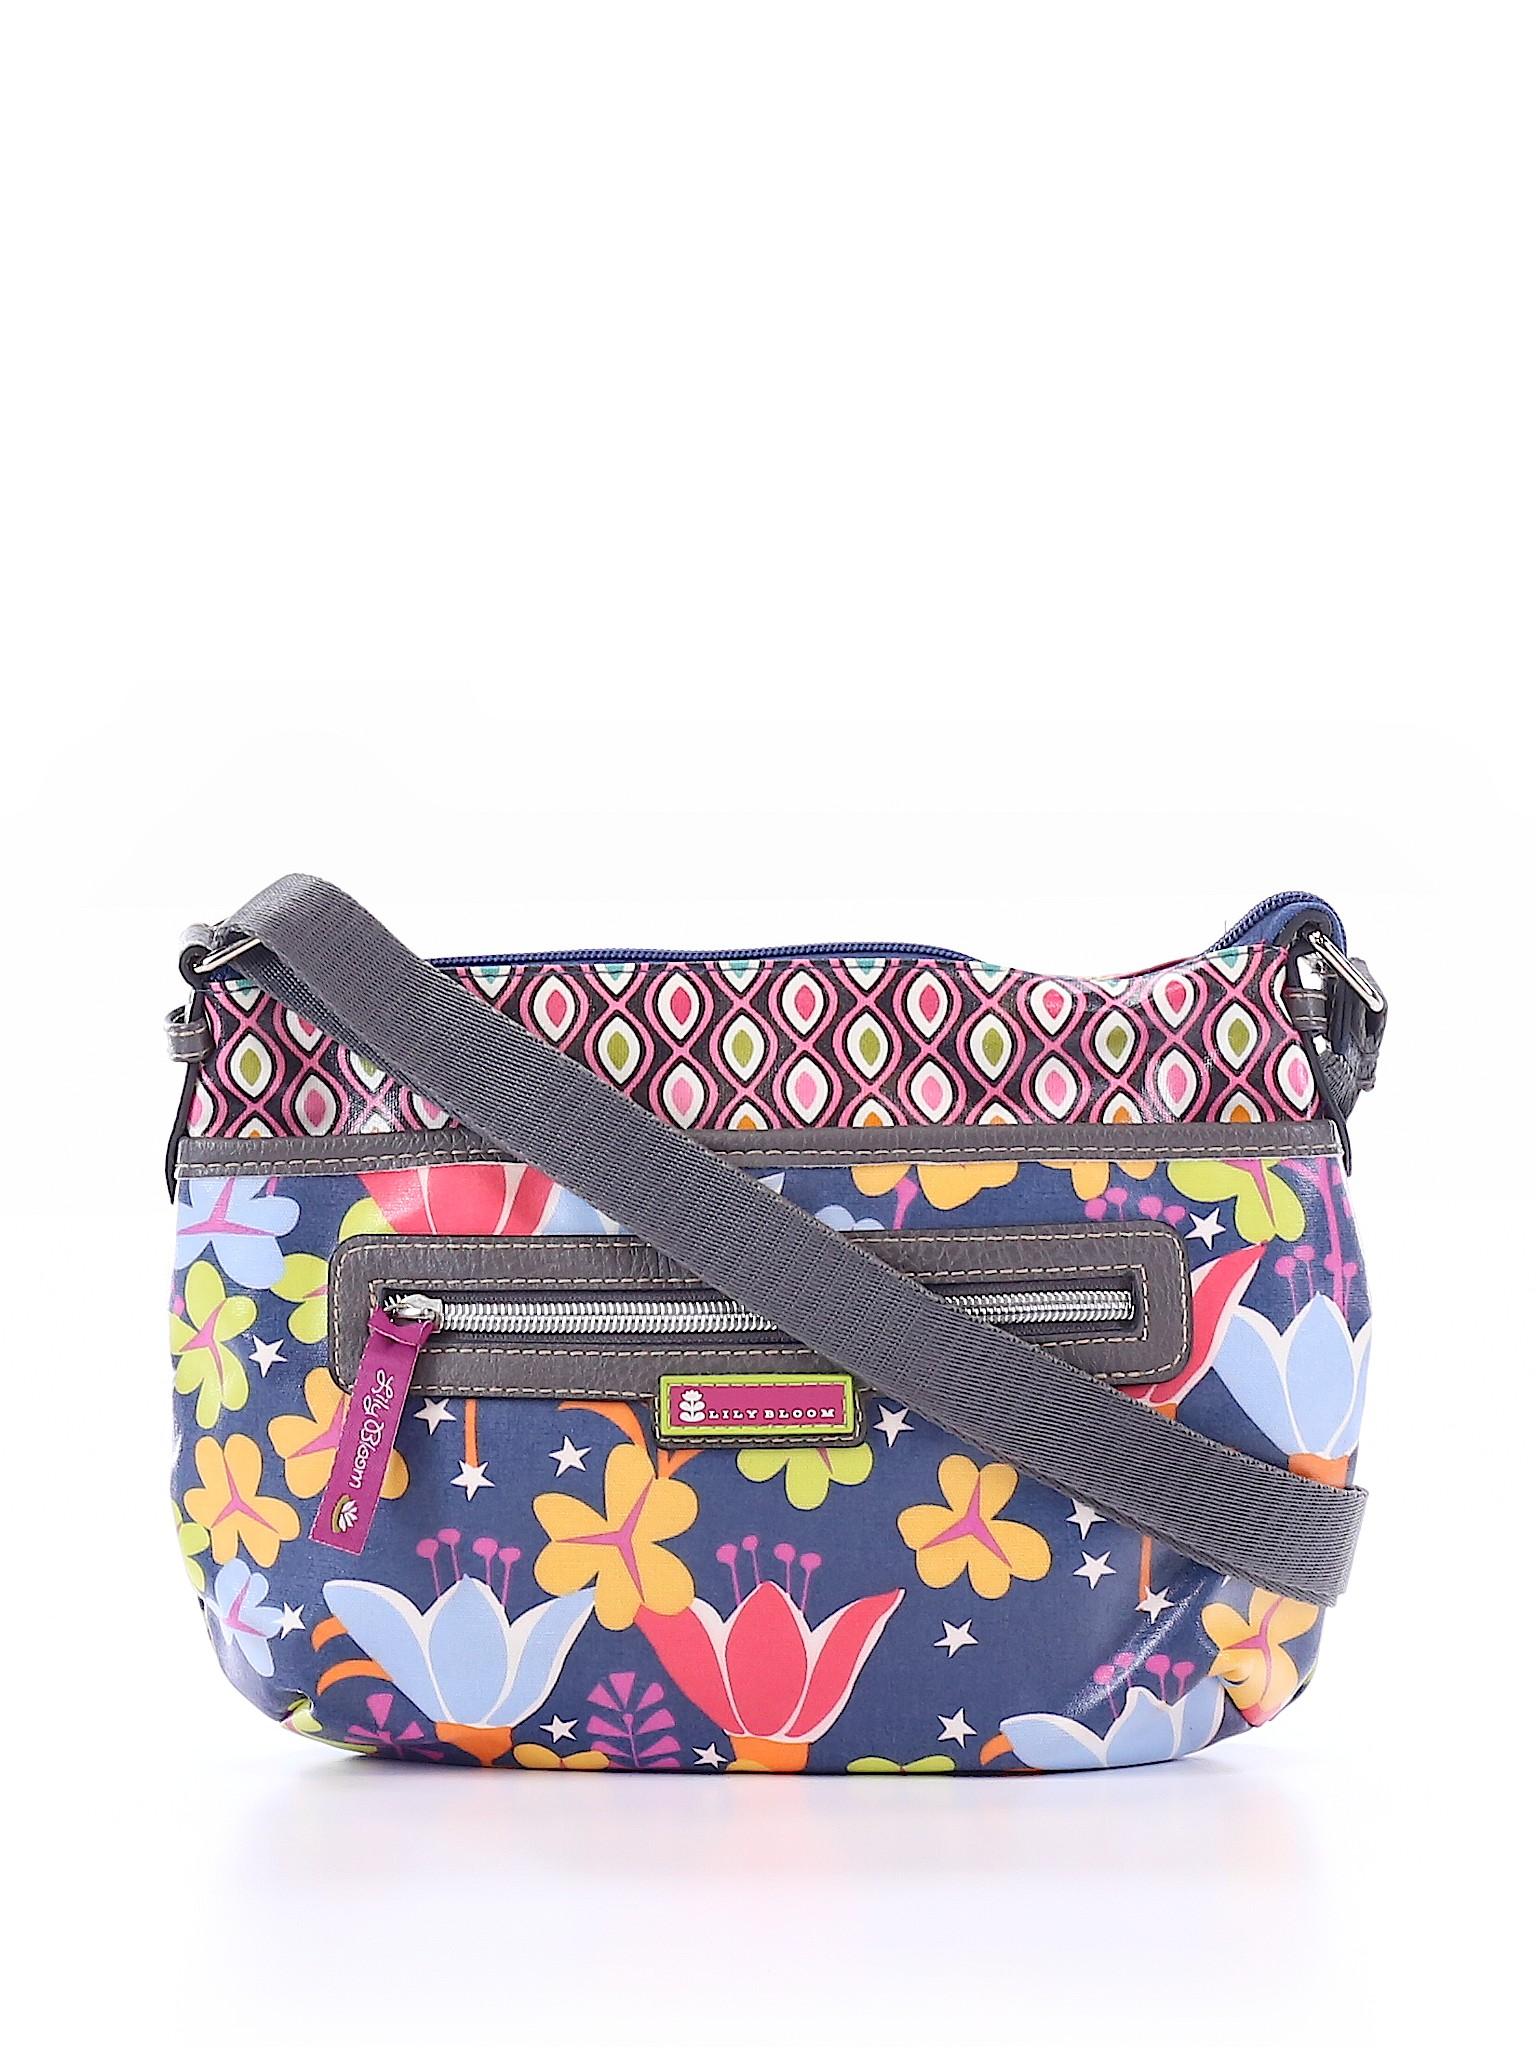 Lily Bloom Handbags On Up To 90 Off Retail Thredup b9bc1604cdda8